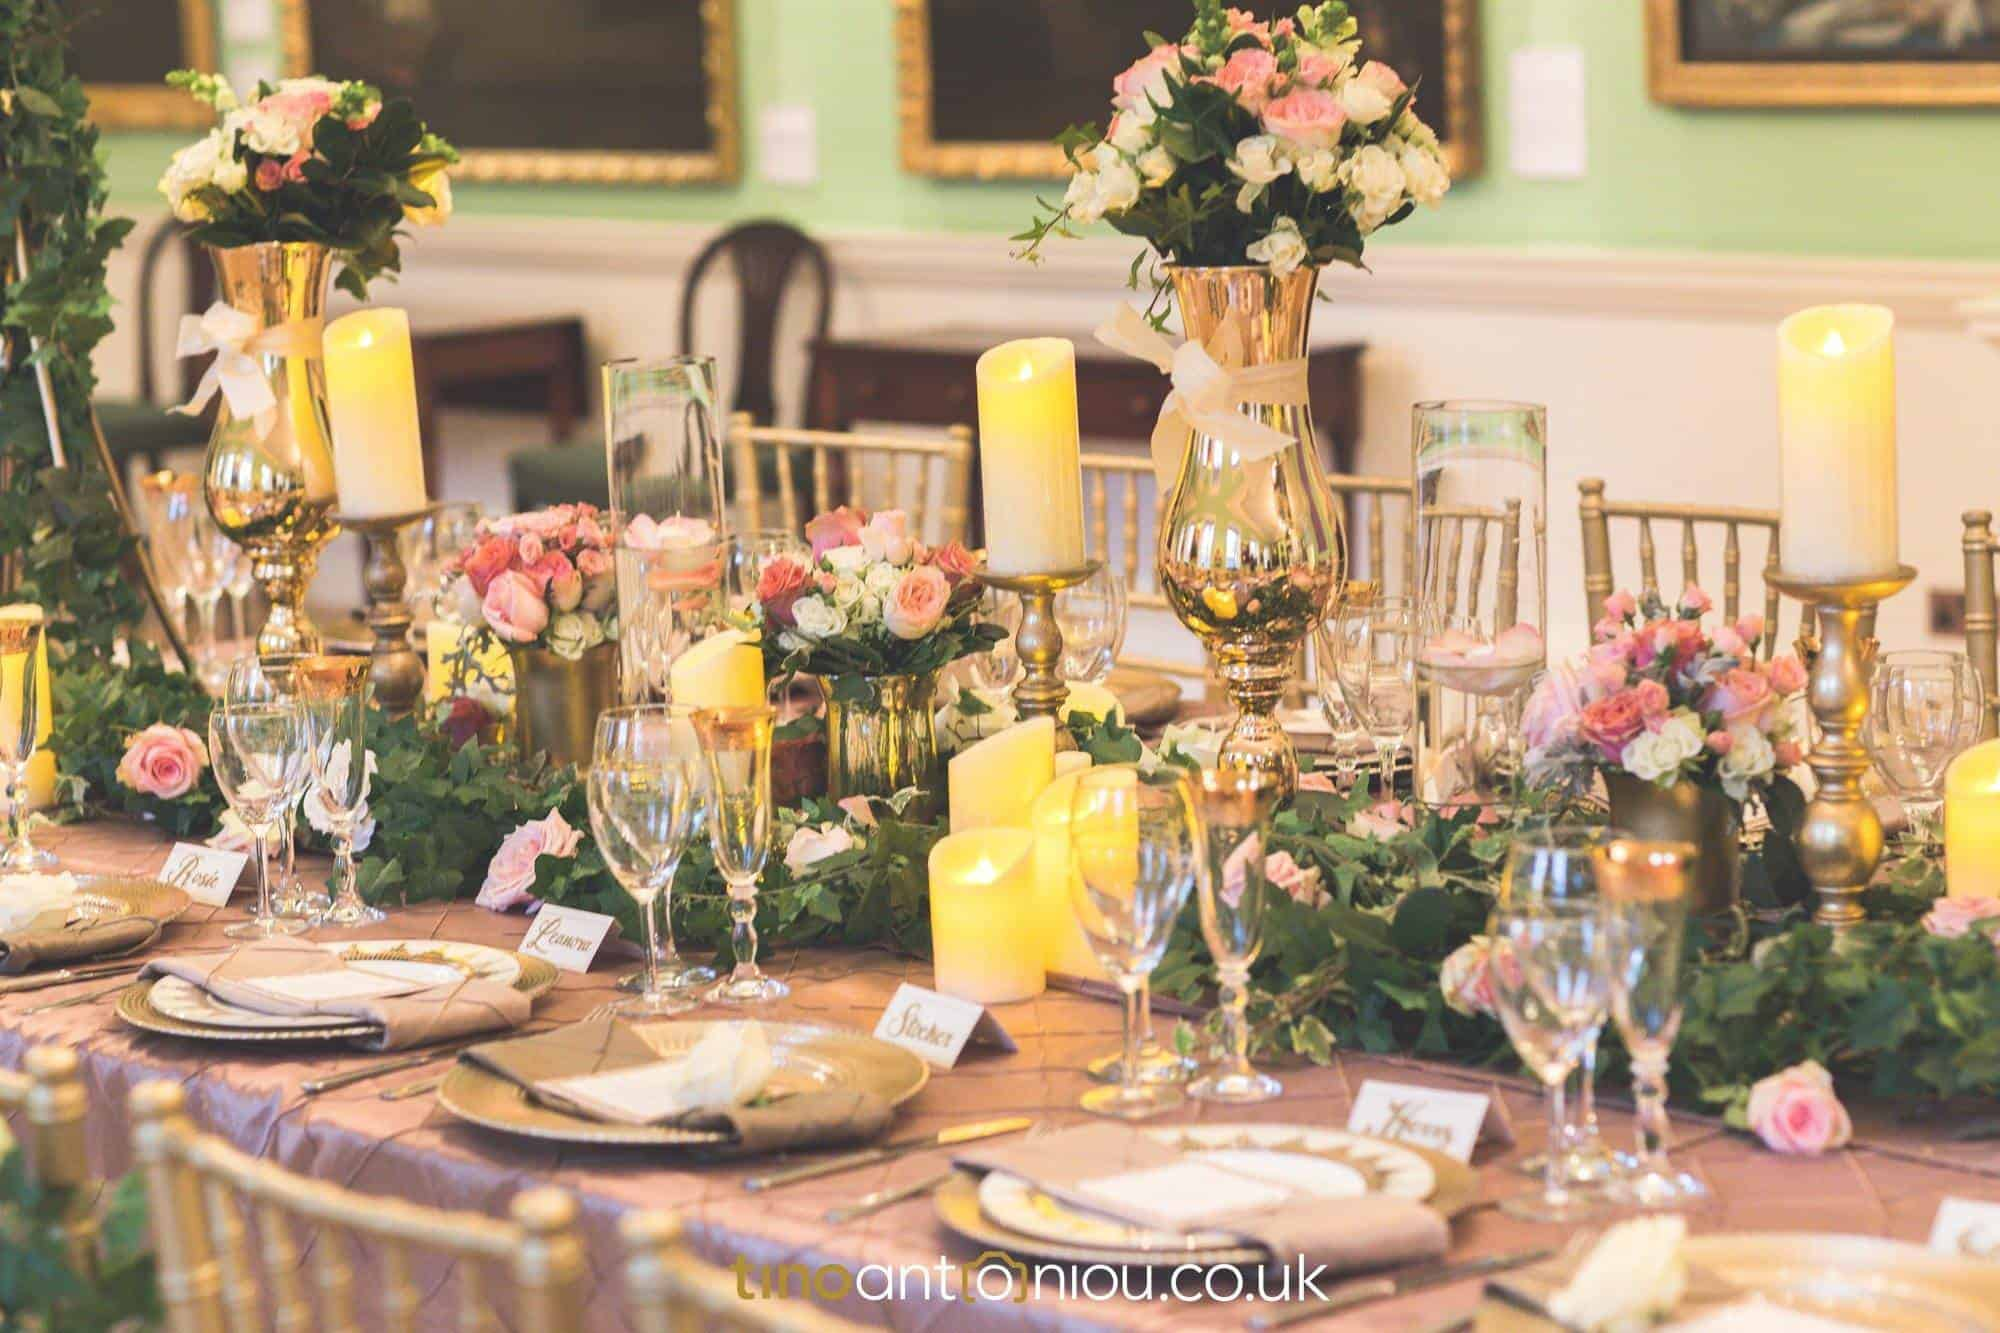 Edwardian Luxury - A Downton Style Shoot